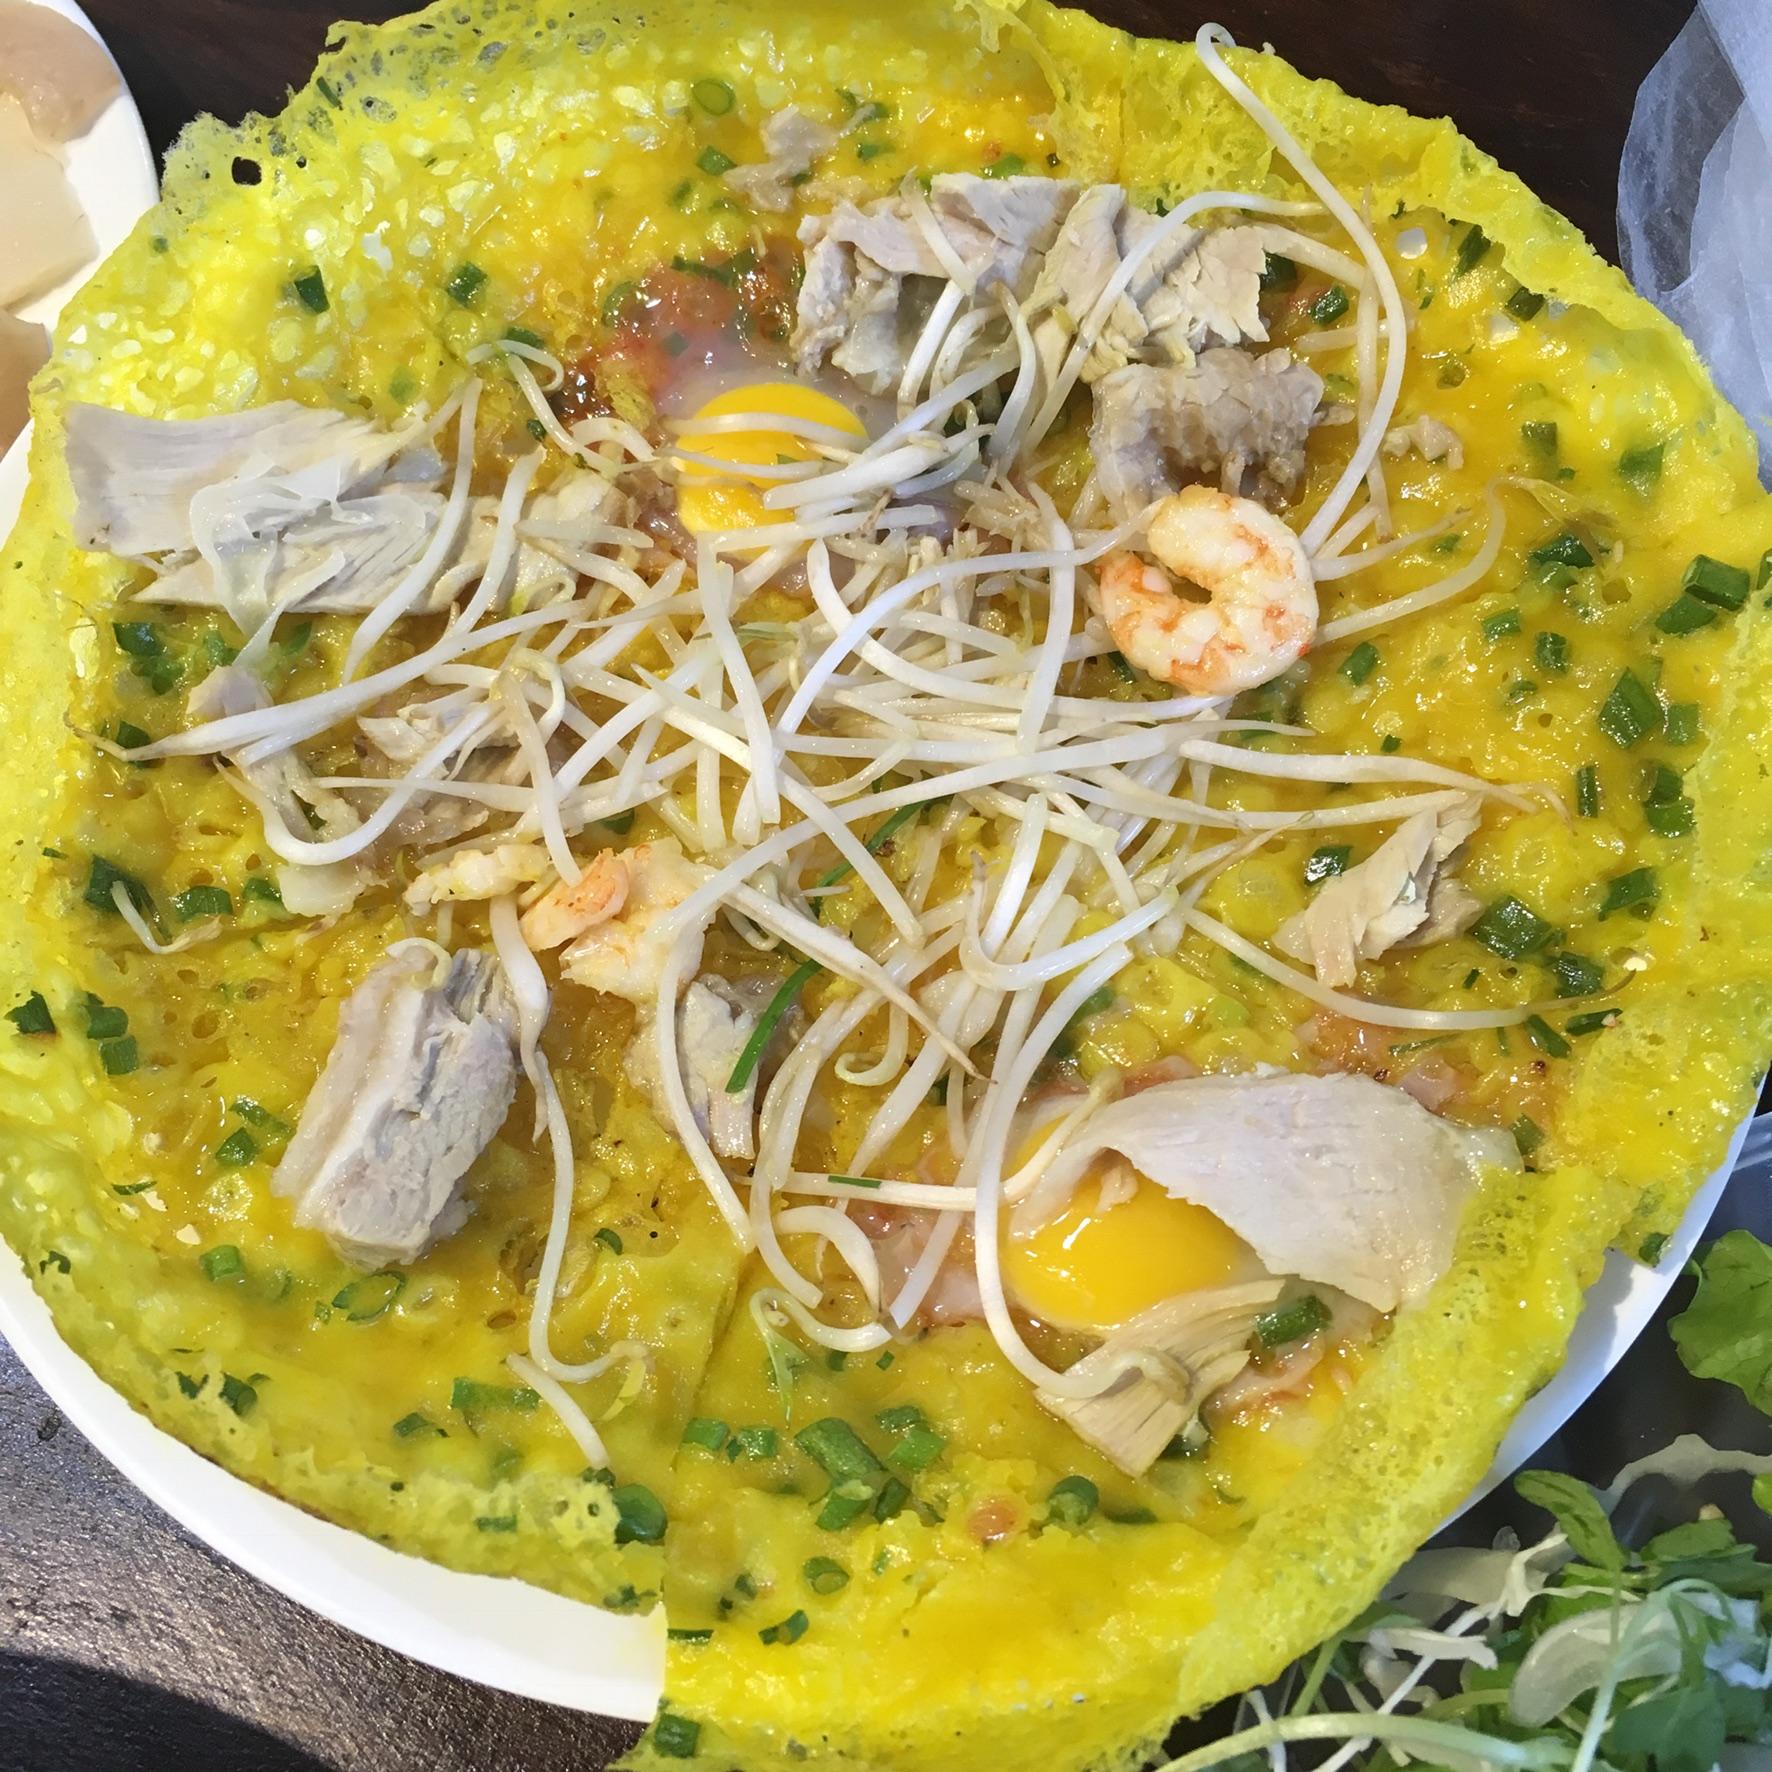 Banh Xeo - Vietnamese pancakes